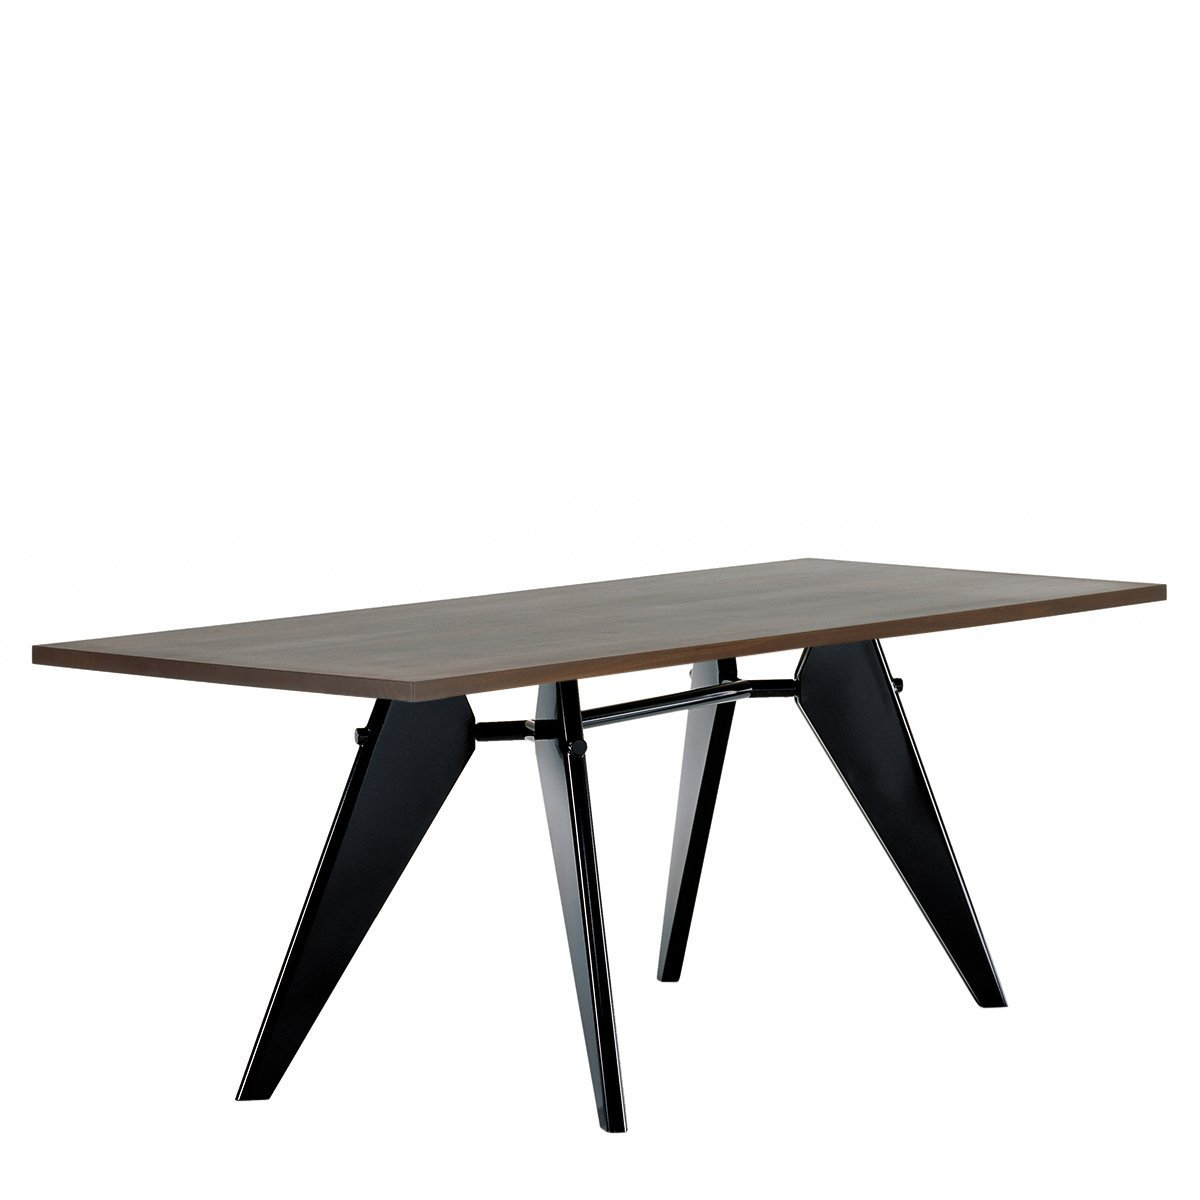 Vitra EM Eettafel - Gerookt Eiken - Zwart - 260 x 90 cm.